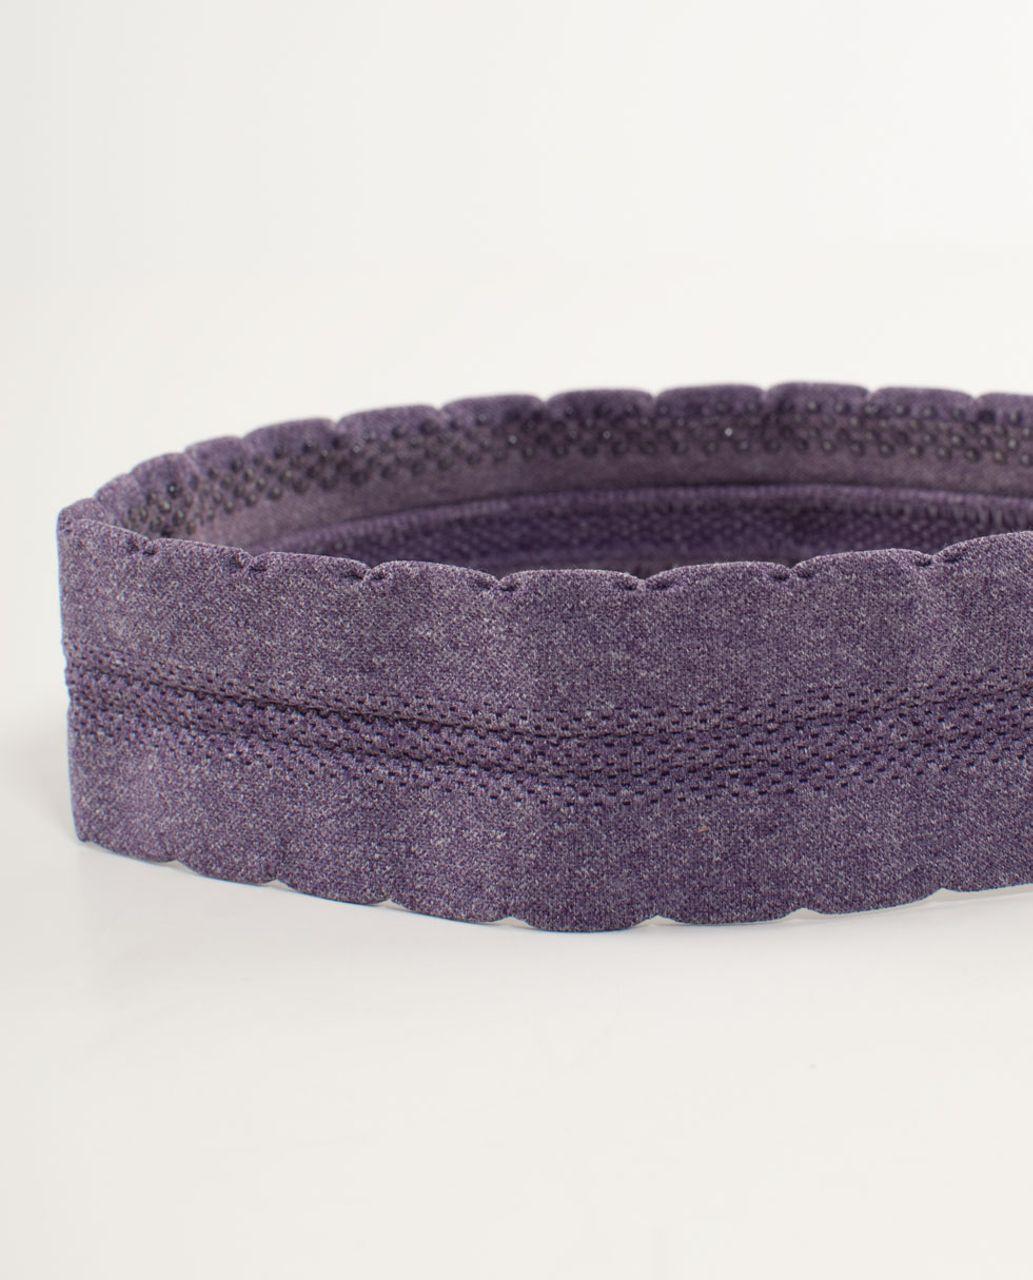 Lululemon Swiftly Headband - Concord Grape